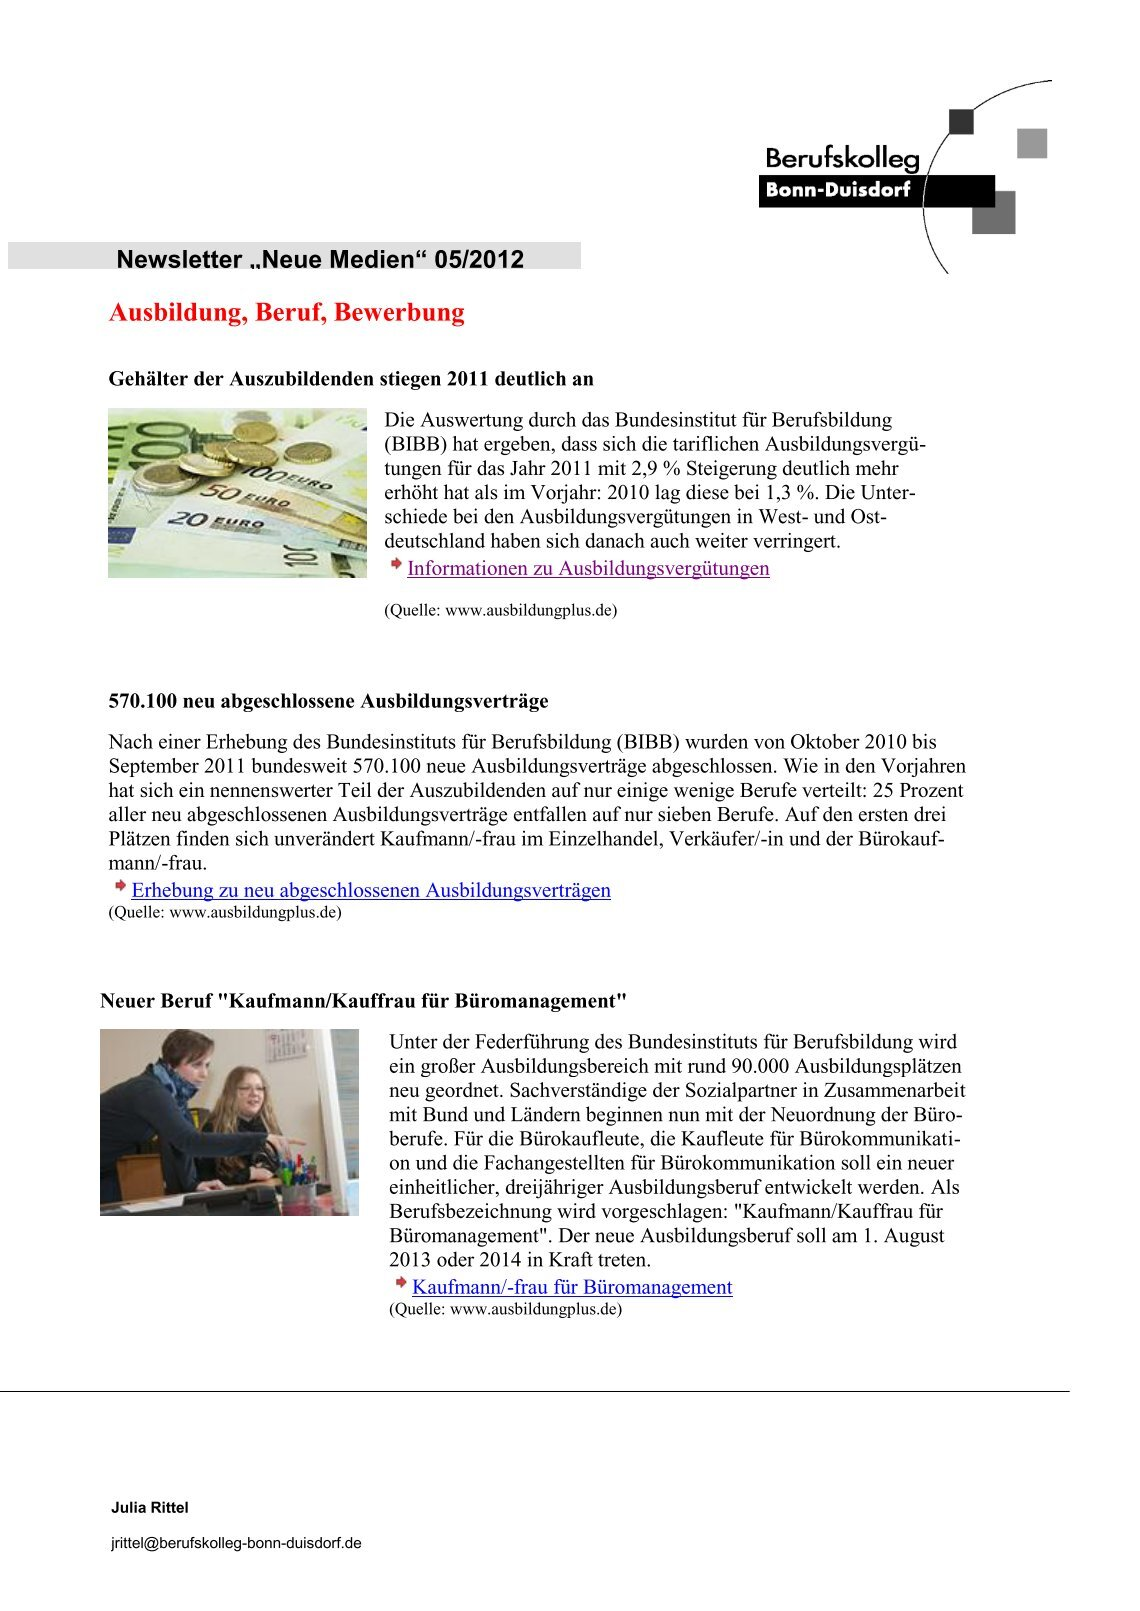 Berufskolleg Bonn Duisdorf 40 free magazines from berufskolleg bonn duisdorf de